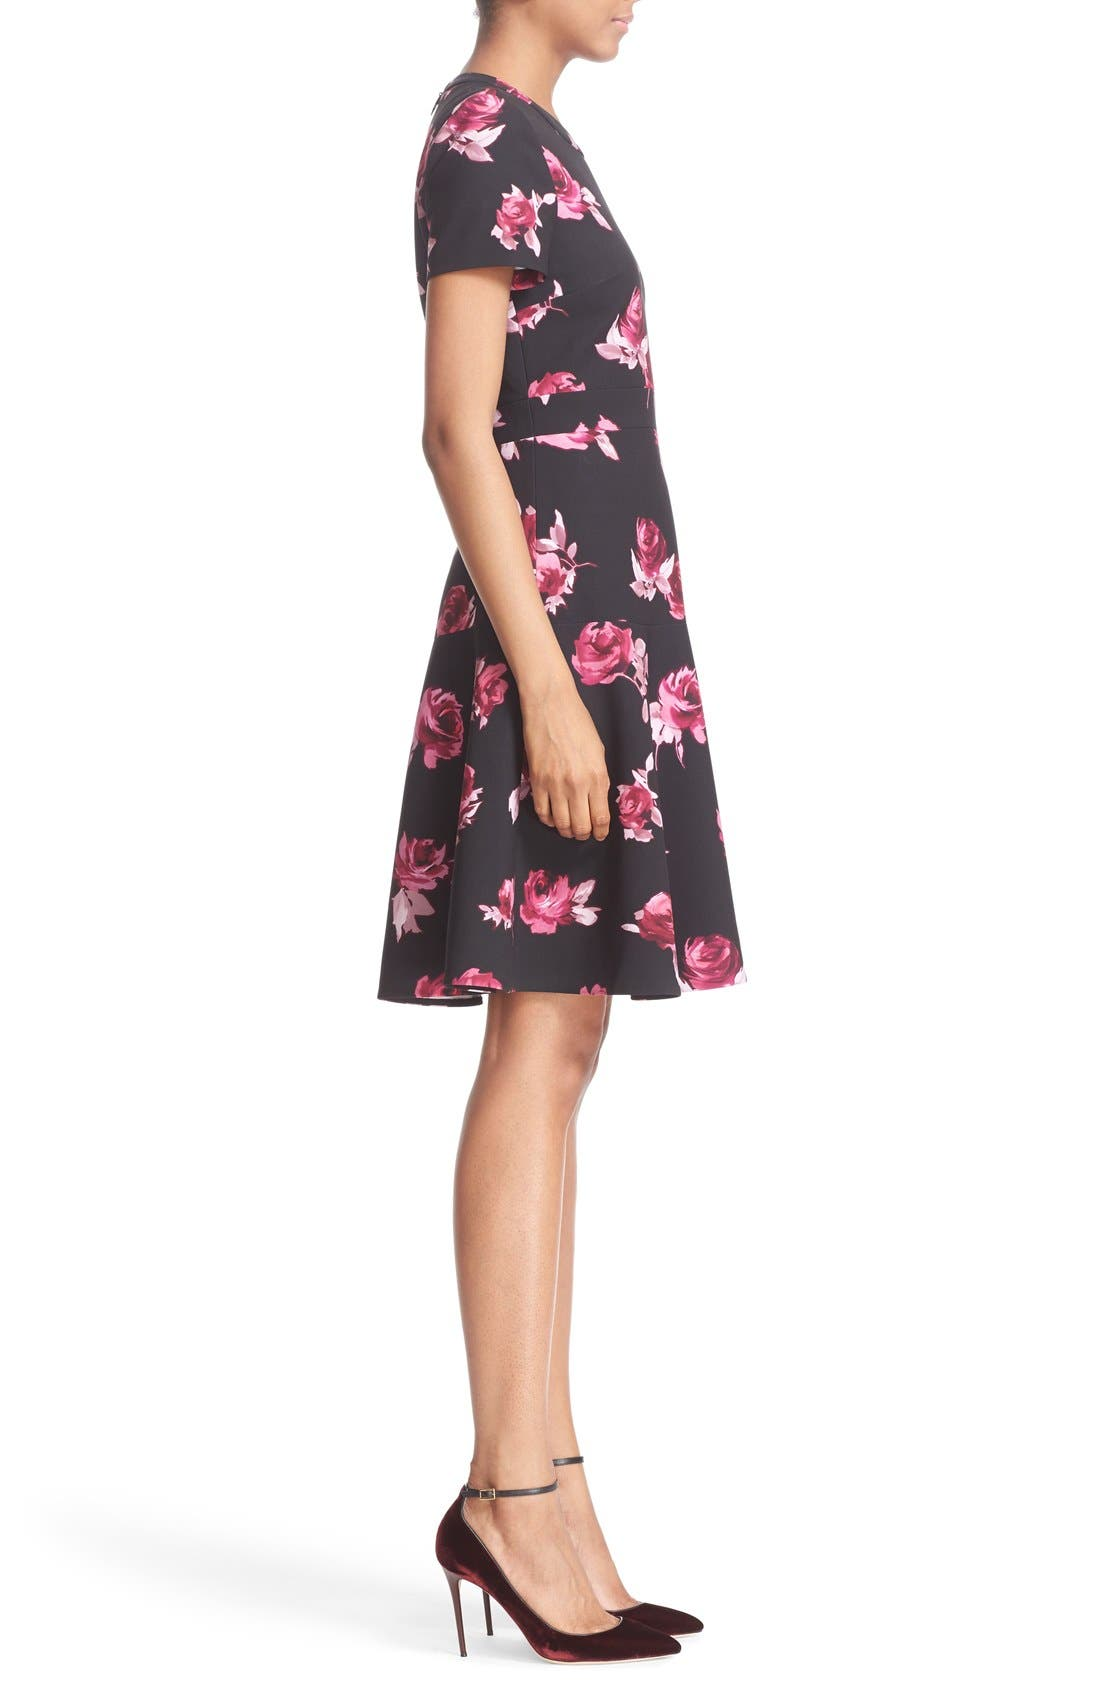 KATE SPADE NEW YORK, 'encore rose' crepe fit & flare dress, Alternate thumbnail 2, color, 001